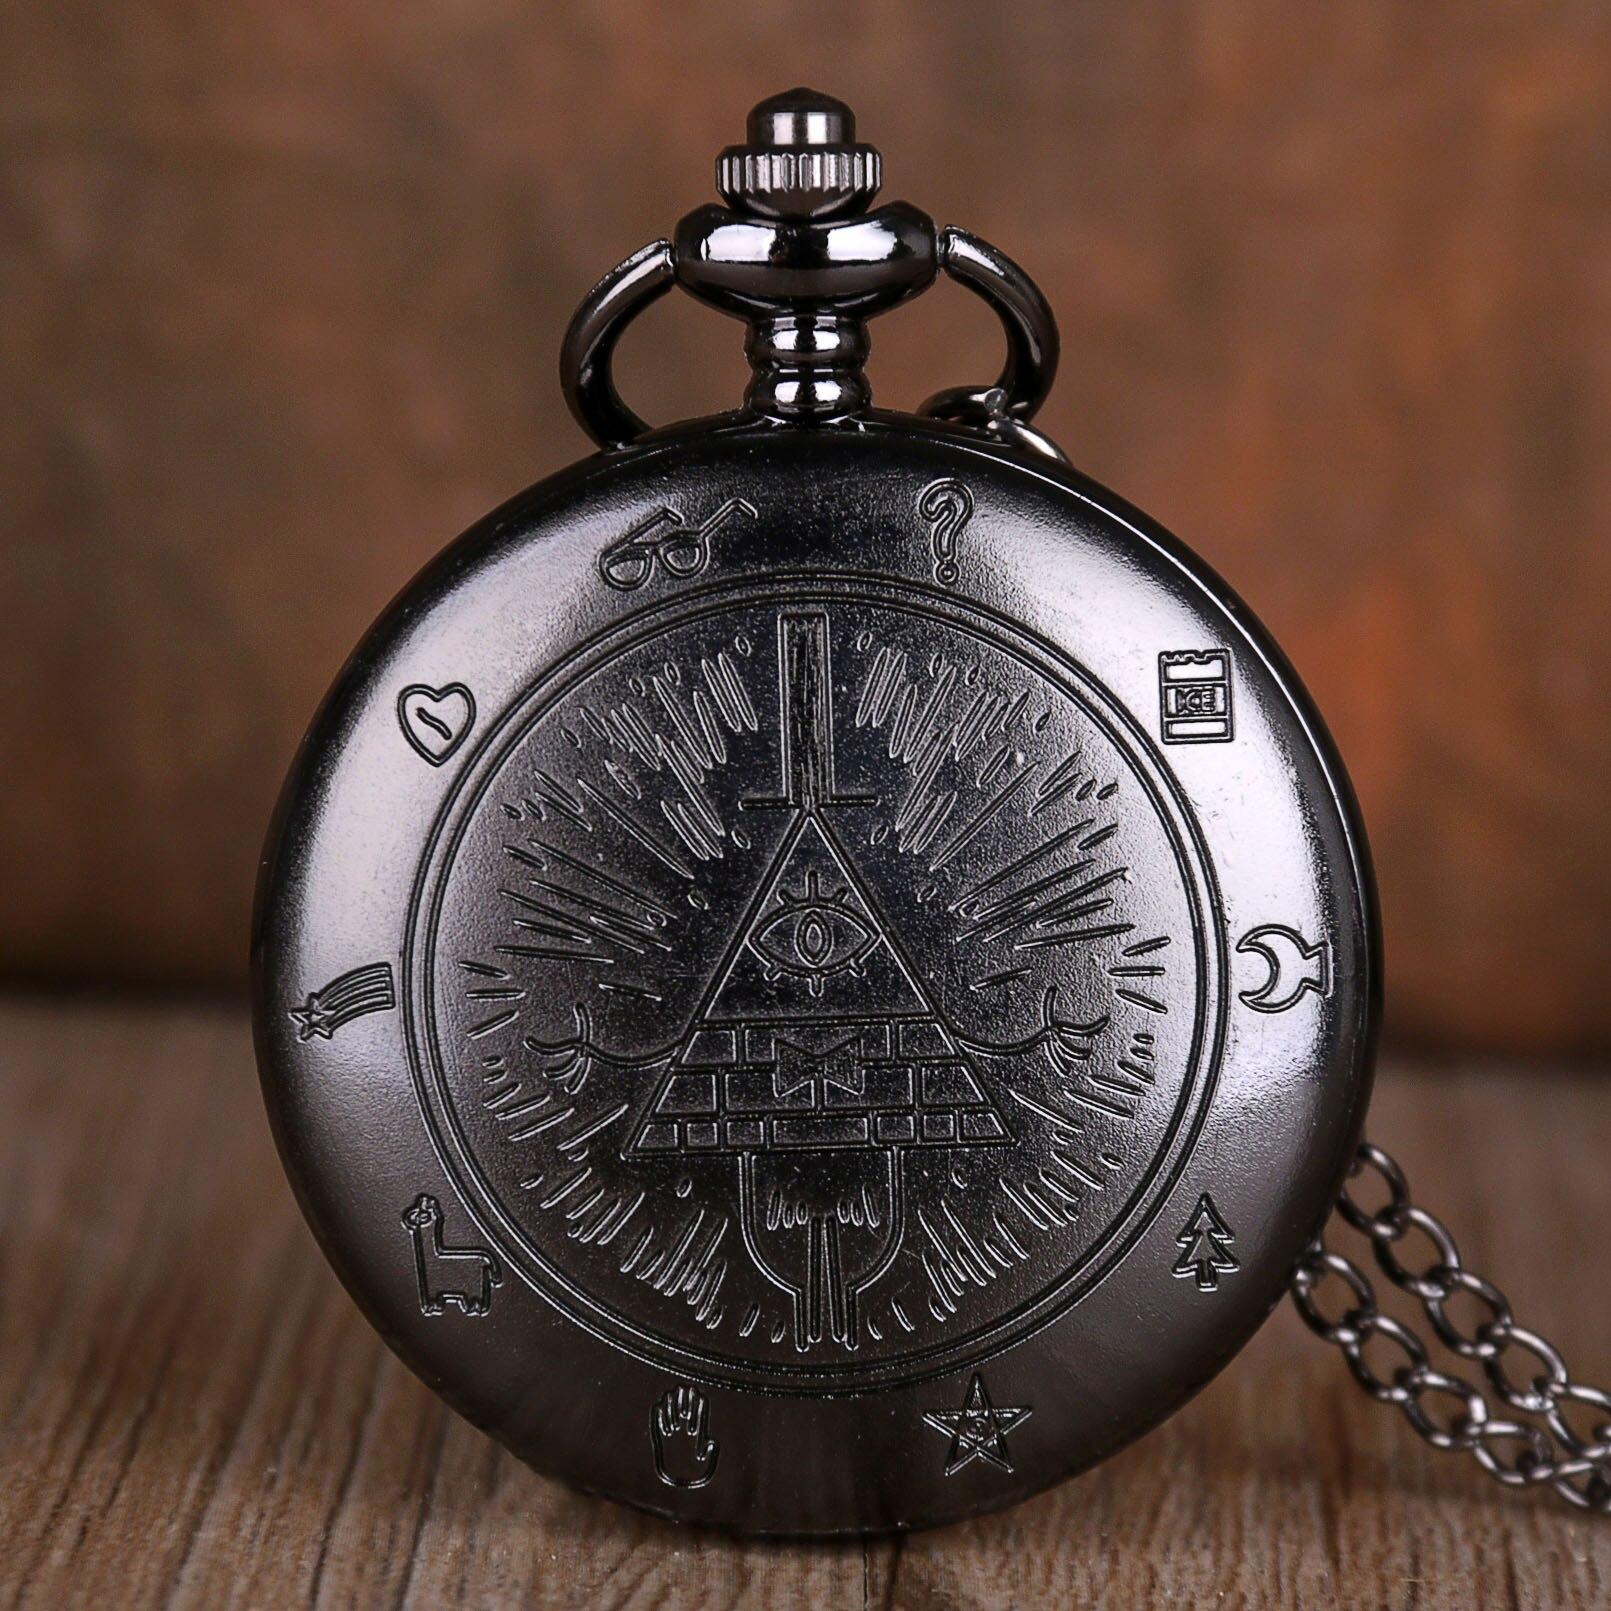 Bill Cipher Gravity Falls Steampunk Retro Antique Quartz Pocket Watch Pendant Necklace Men Women Kid Fob Watches Chain Gift